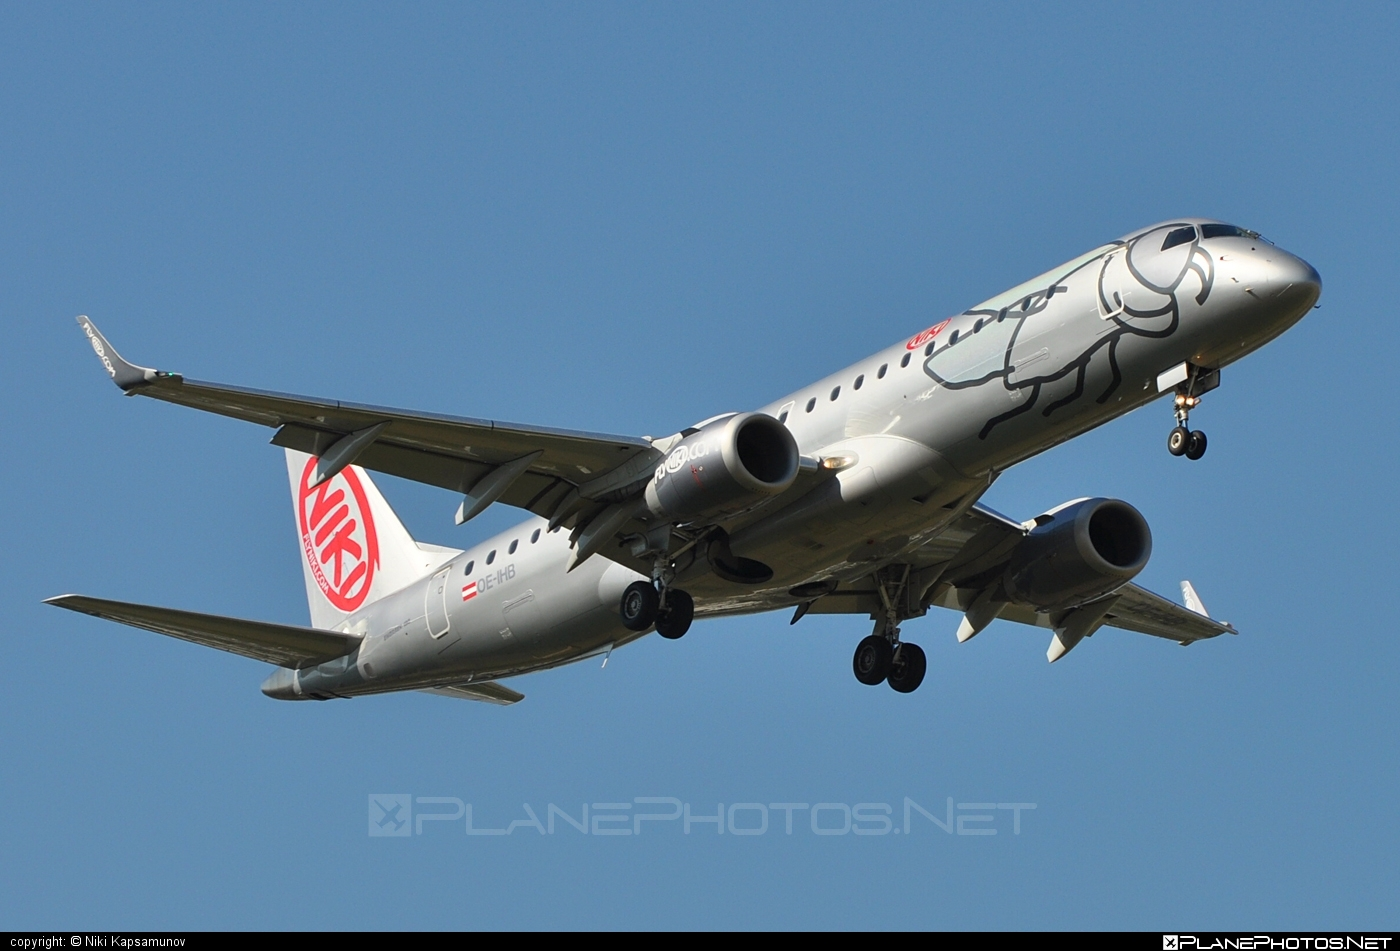 Embraer E190LR (ERJ-190-100LR) - OE-IHB operated by Niki #e190 #e190100 #e190100lr #e190lr #embraer #embraer190 #embraer190100lr #embraer190lr #flyniki #niki